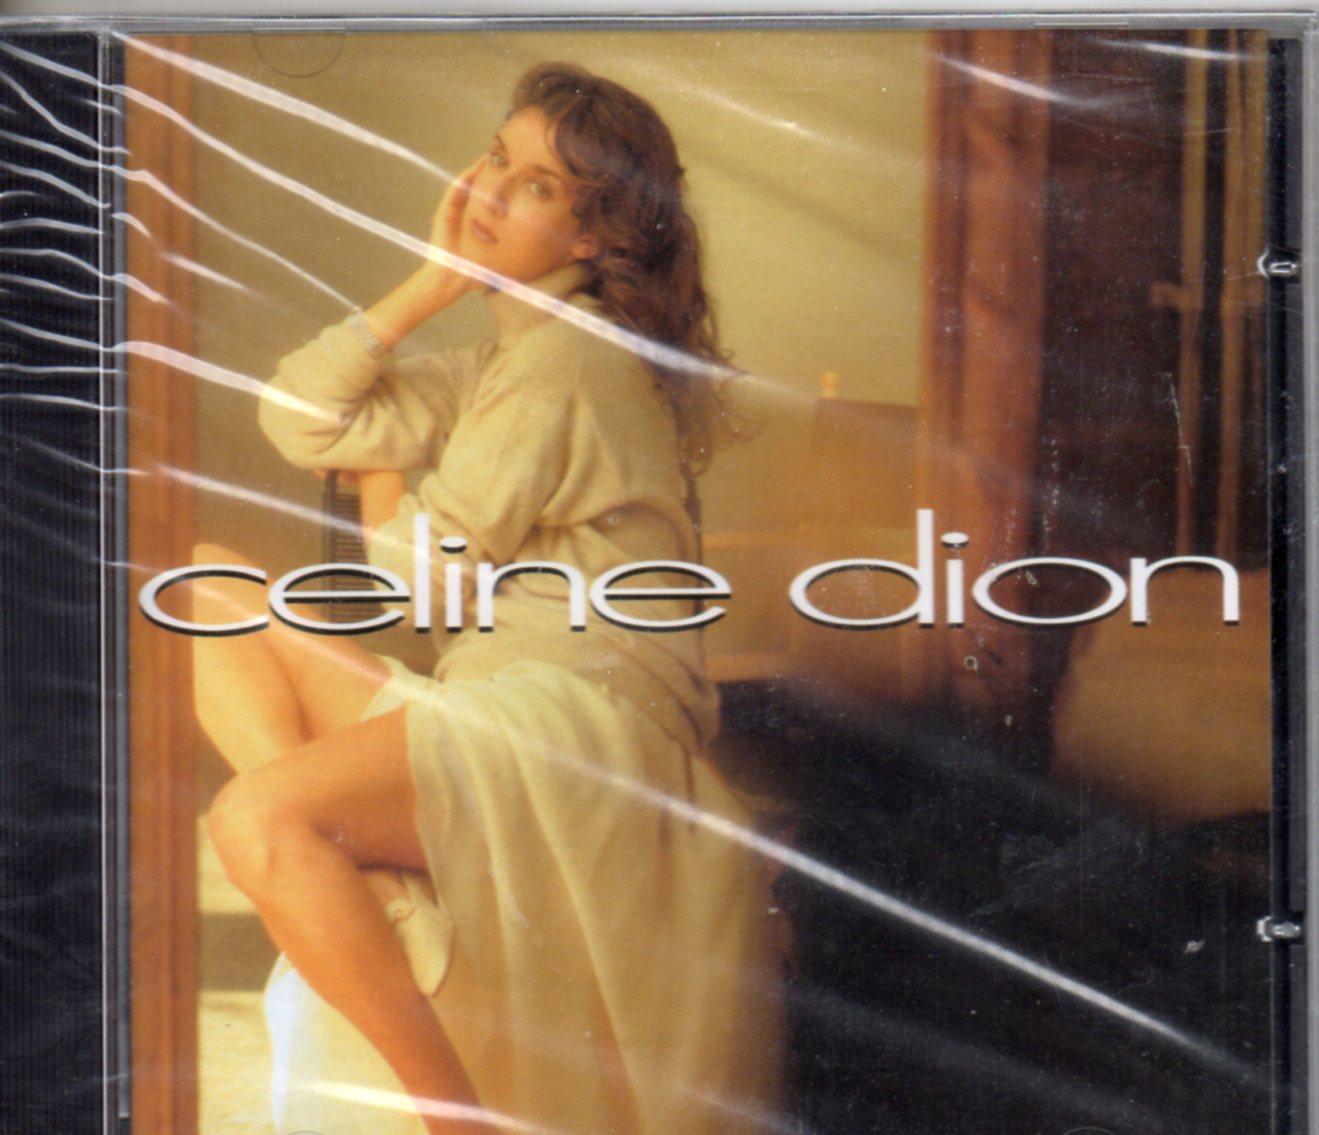 CÉLINE DION - Celine Dion - USA - - CD